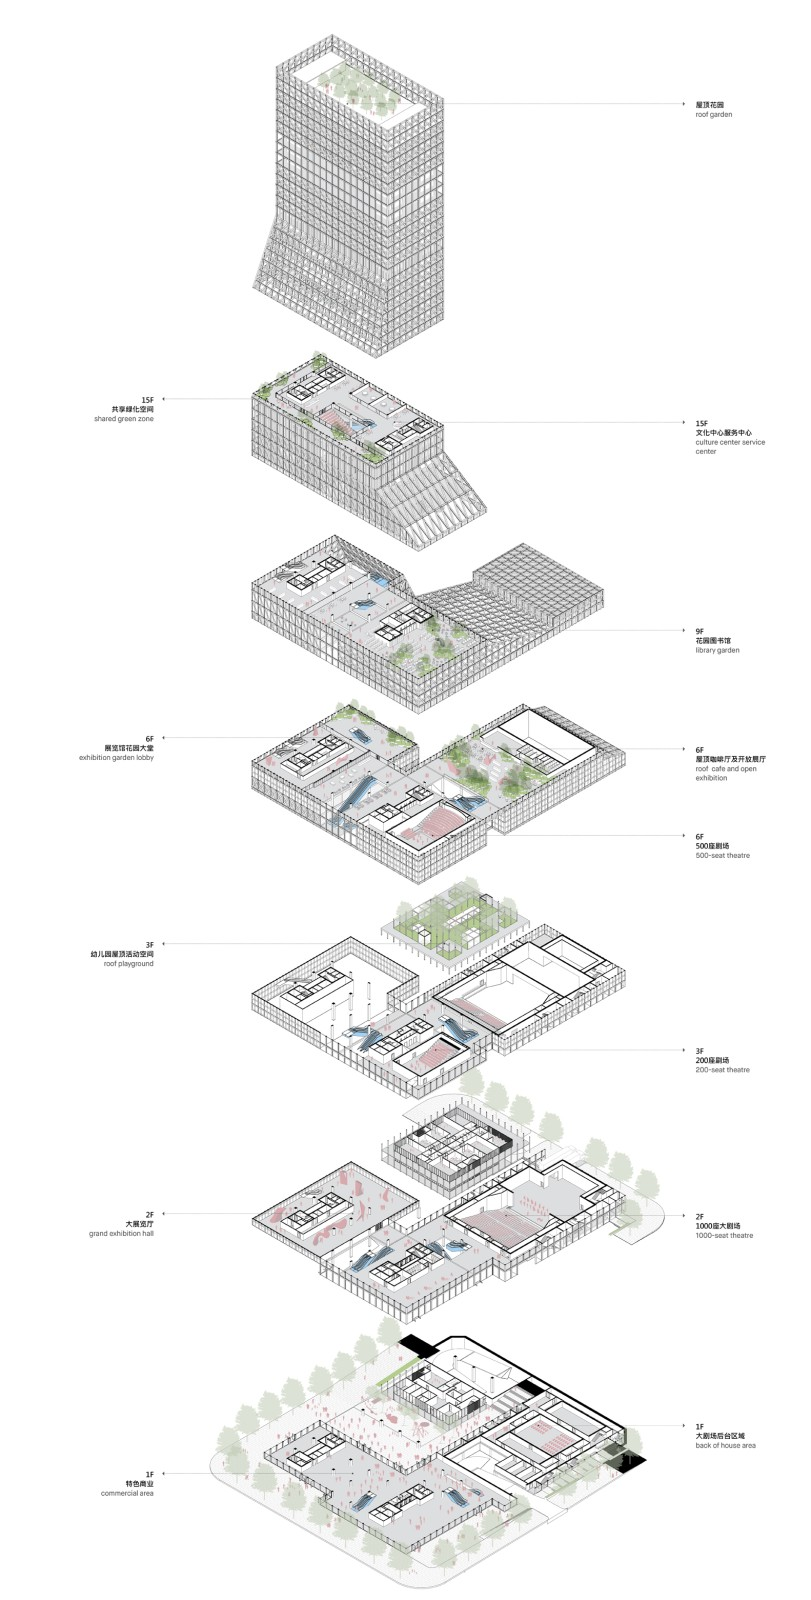 Futian Civic Cultural Centre